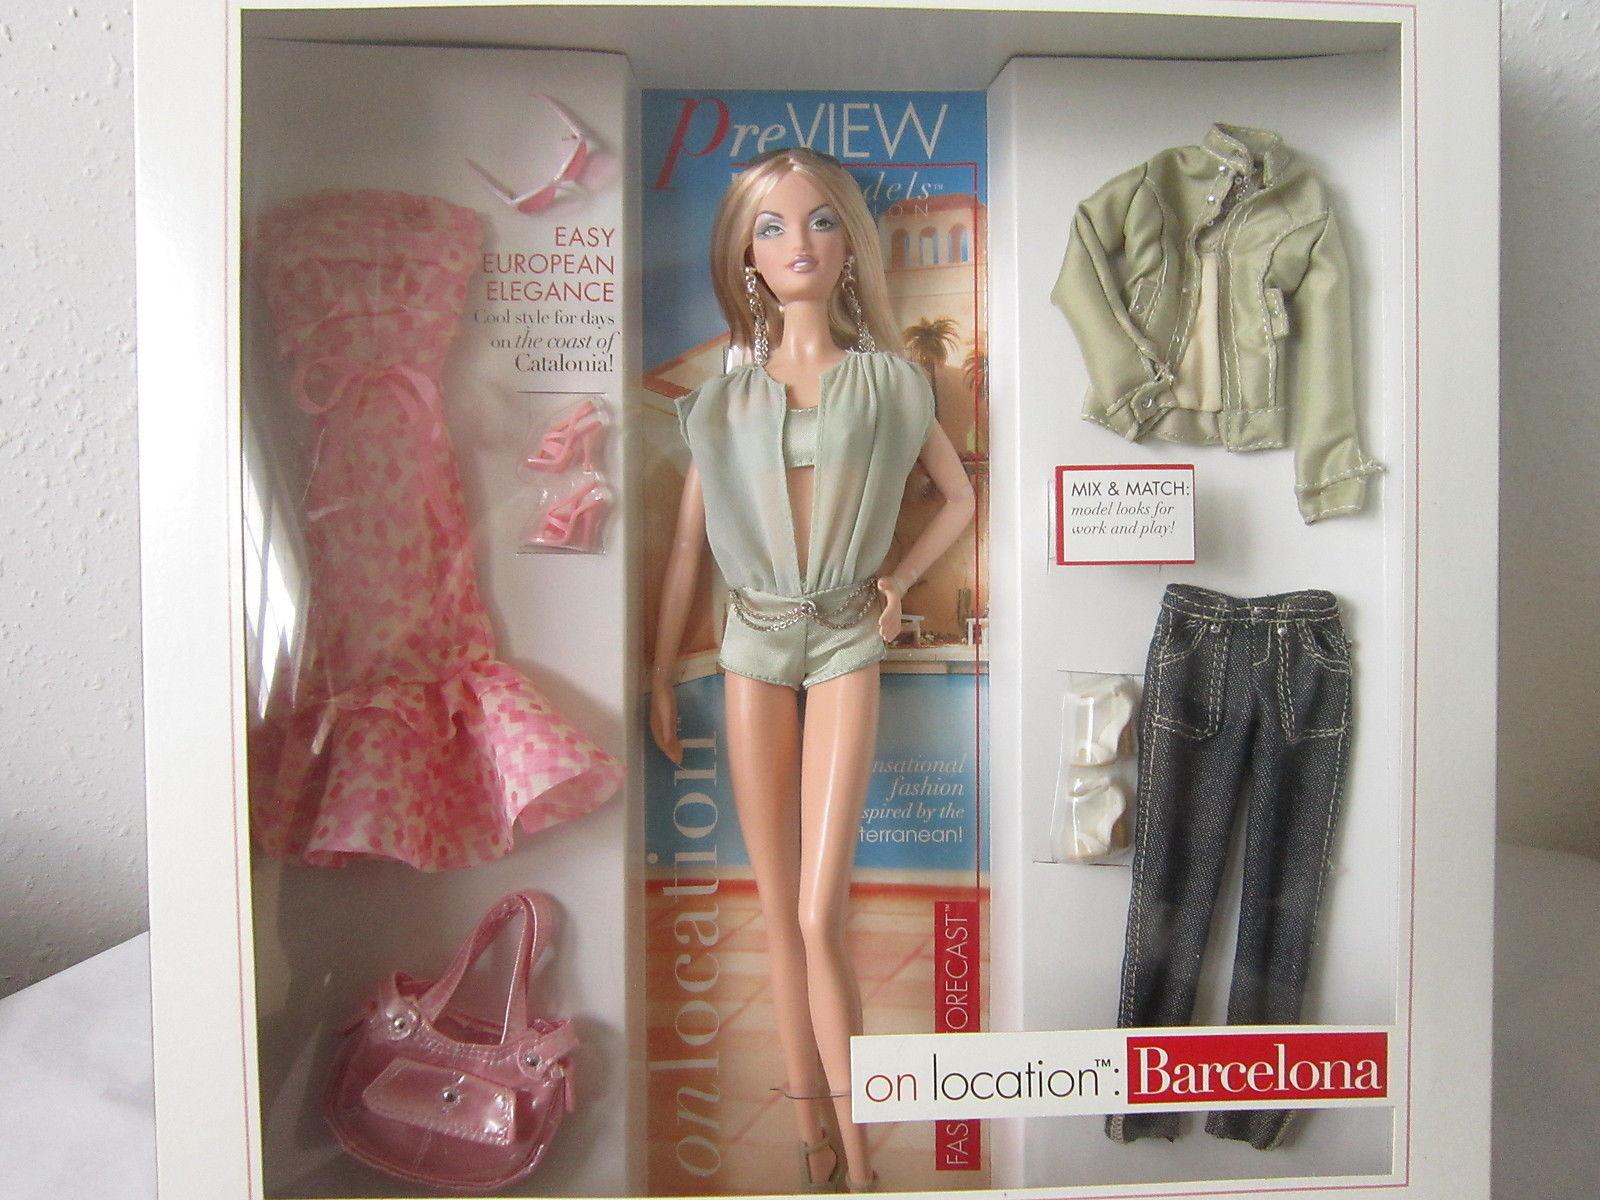 ON LOCATION BARCELONA BARBIE 2007 超模 巴塞羅那 芭比娃娃珍藏